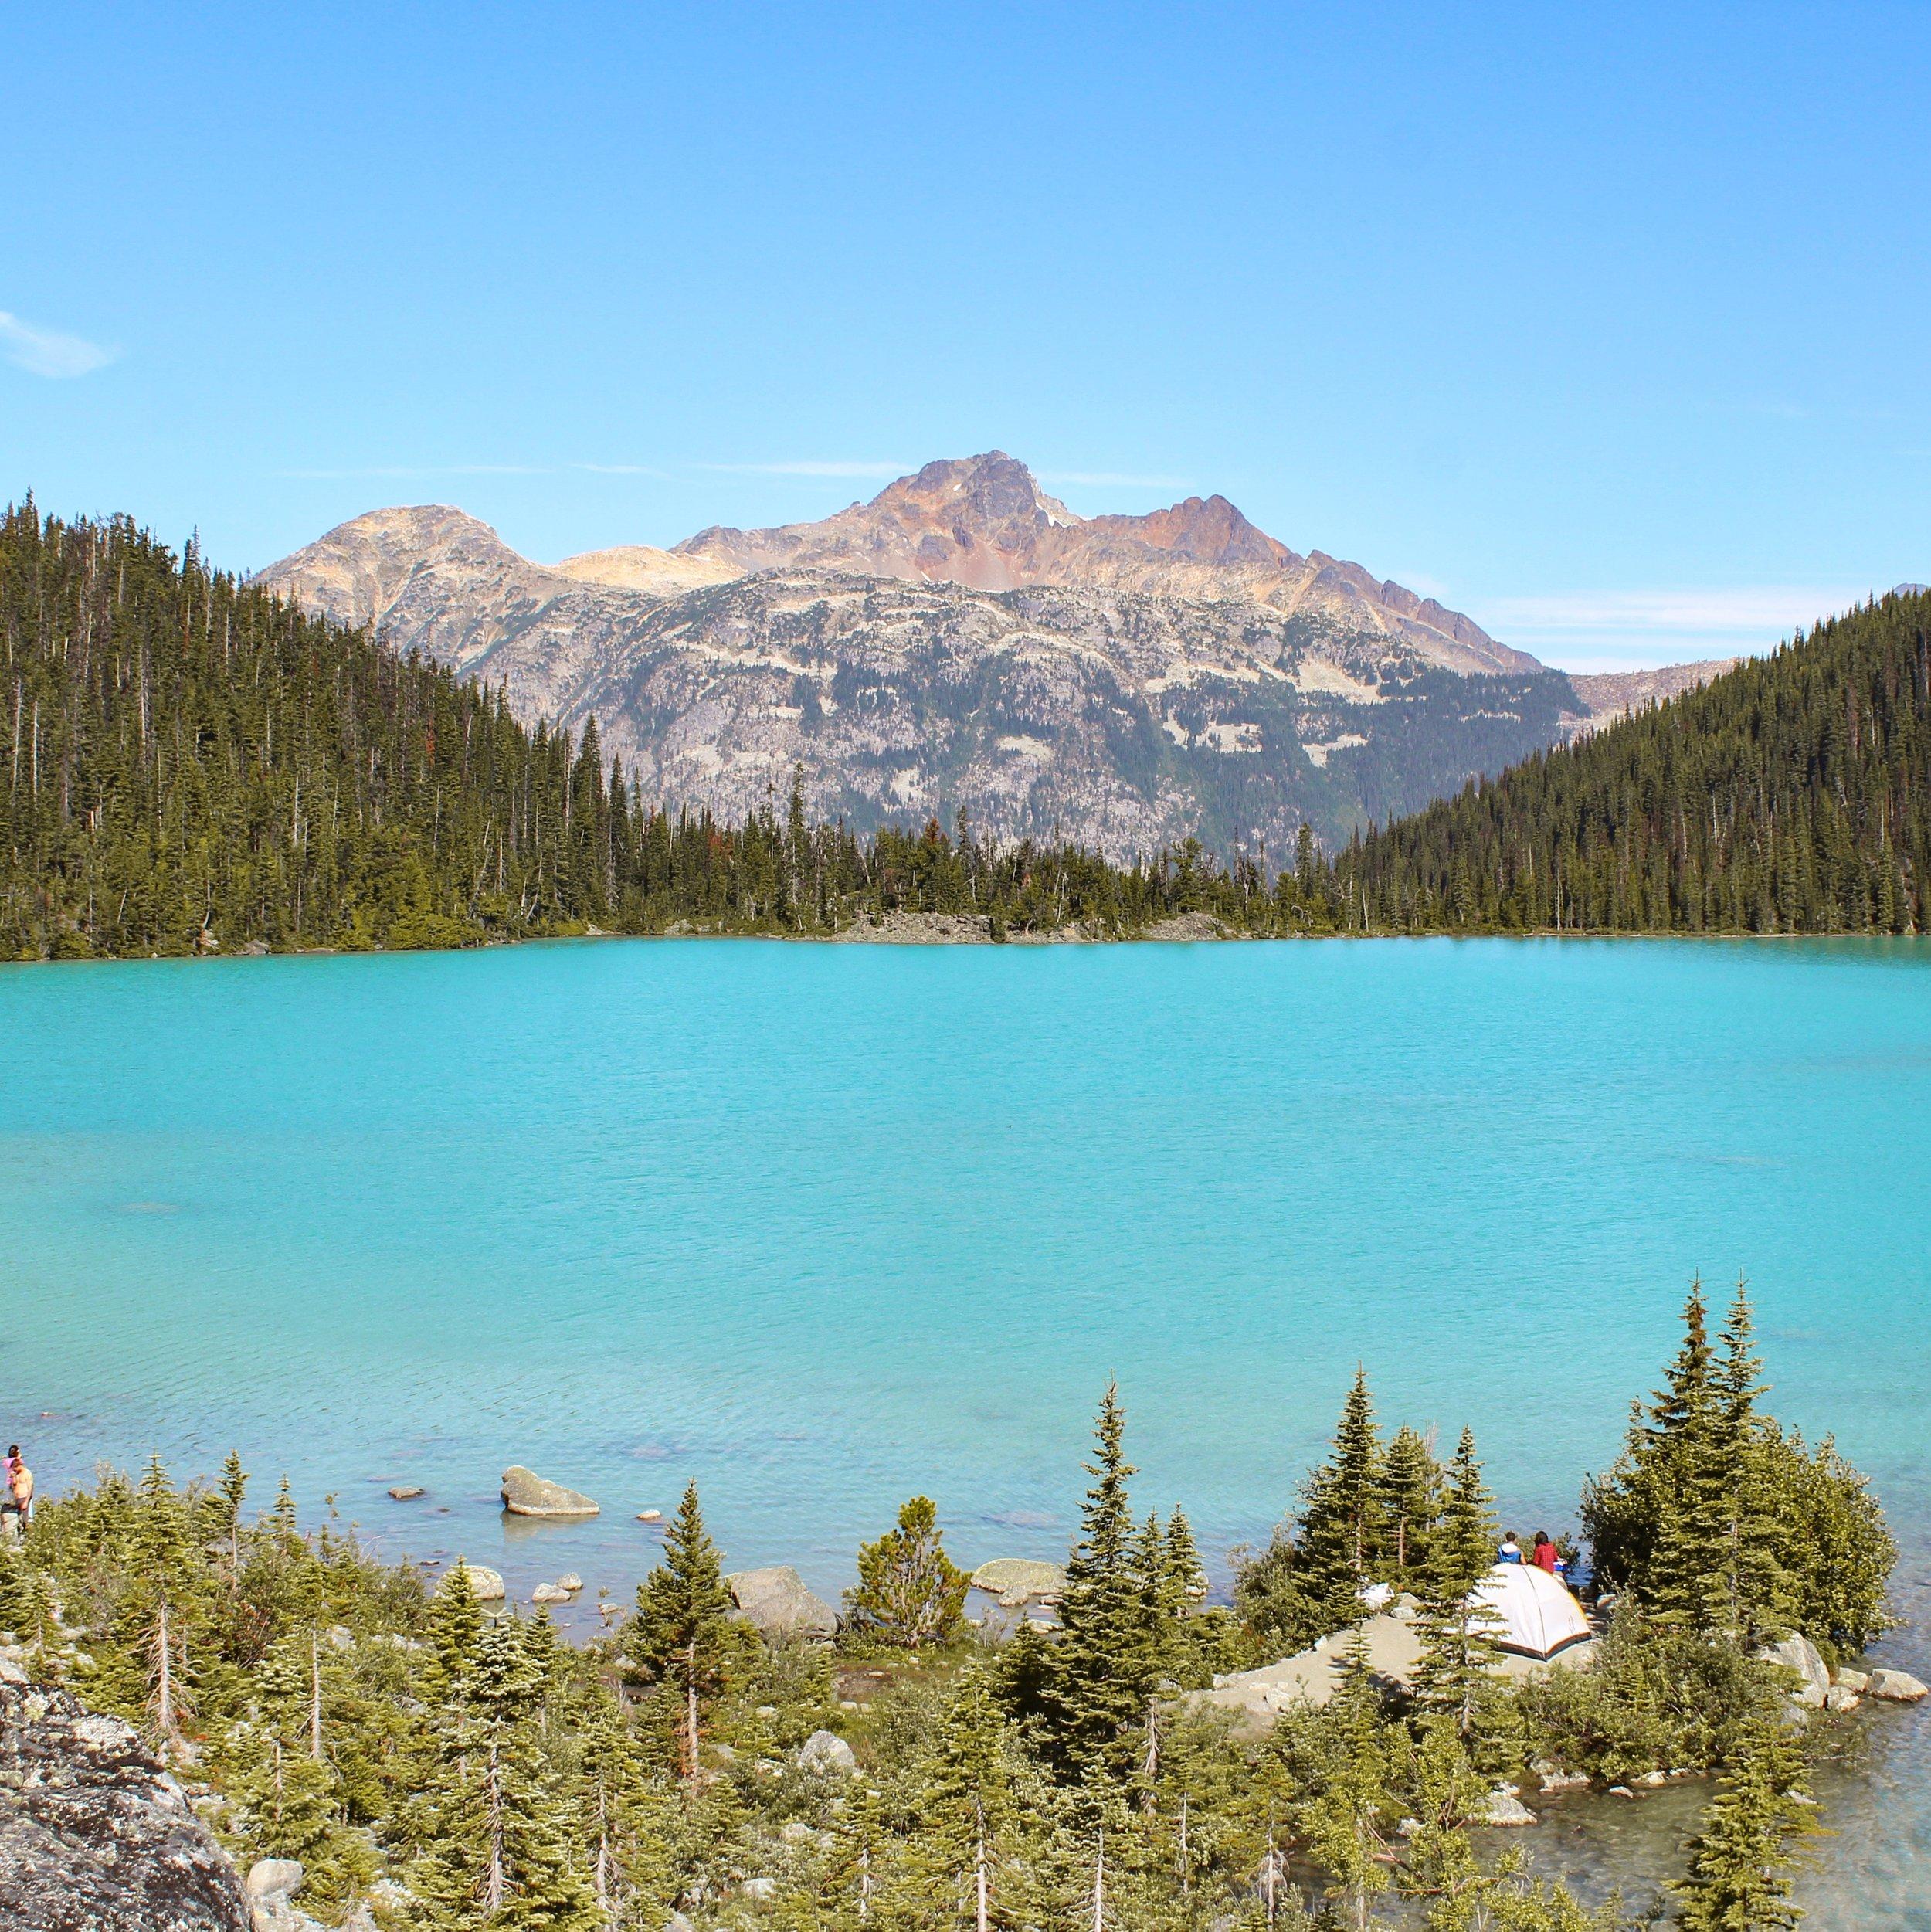 Camping at Upper Joffre Lakes